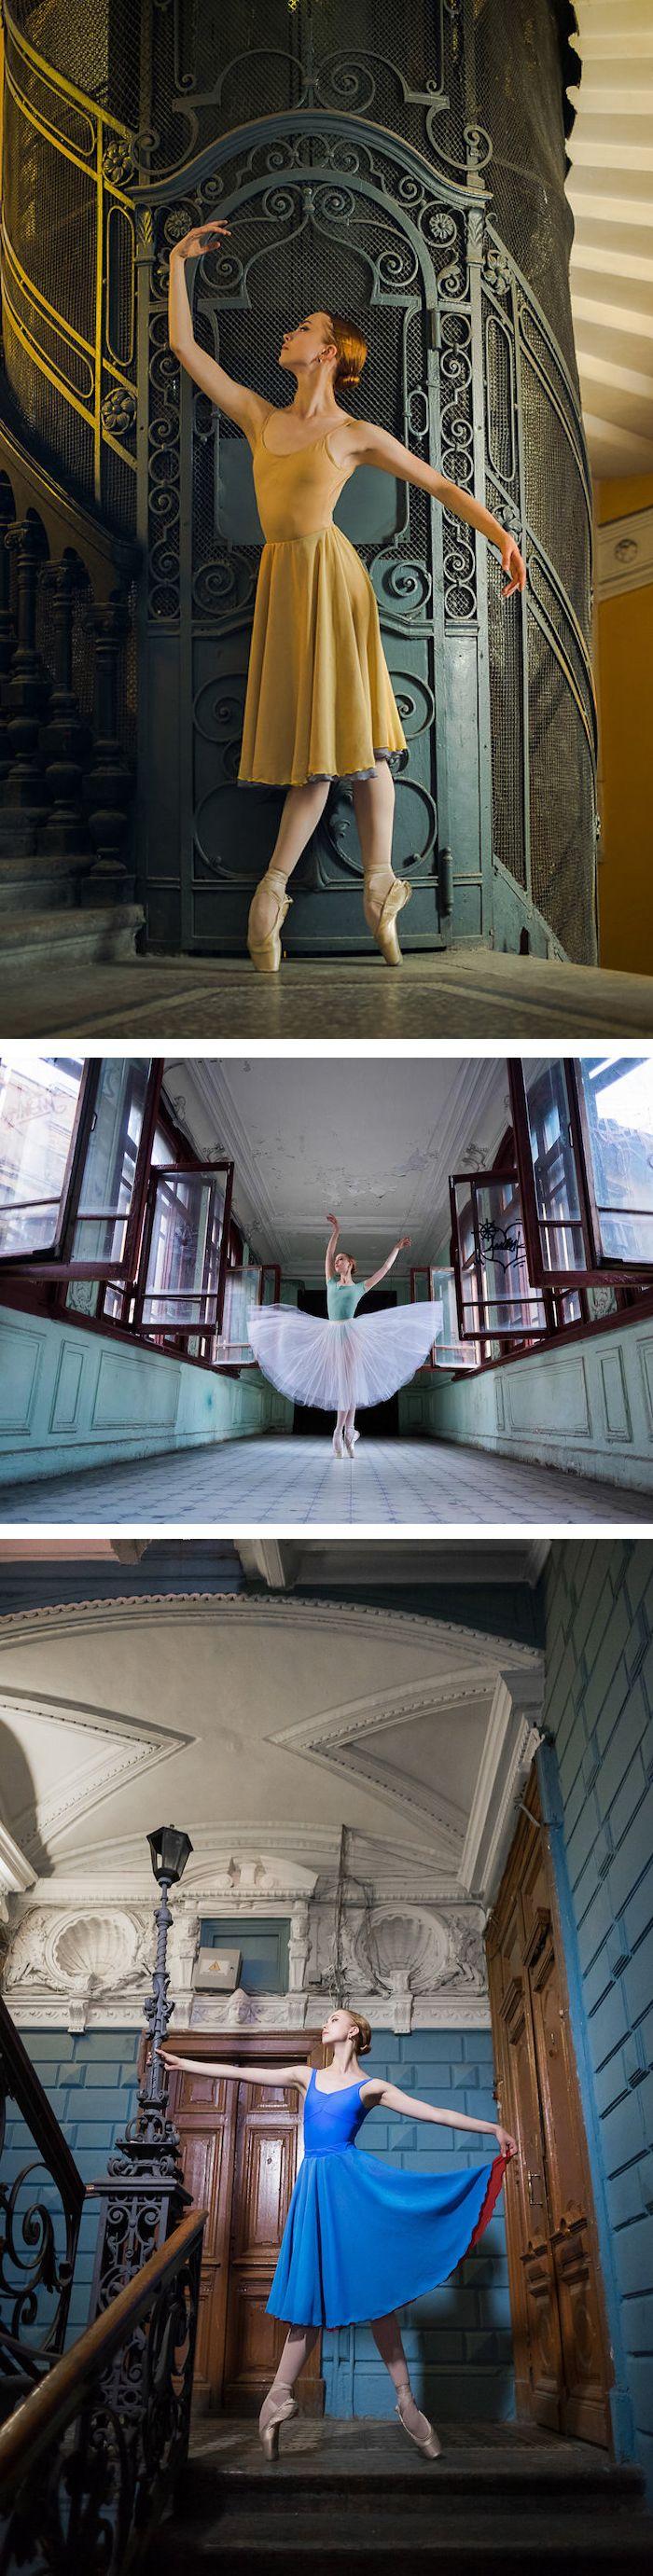 Dance photography by Darian Volkova// Russian ballet